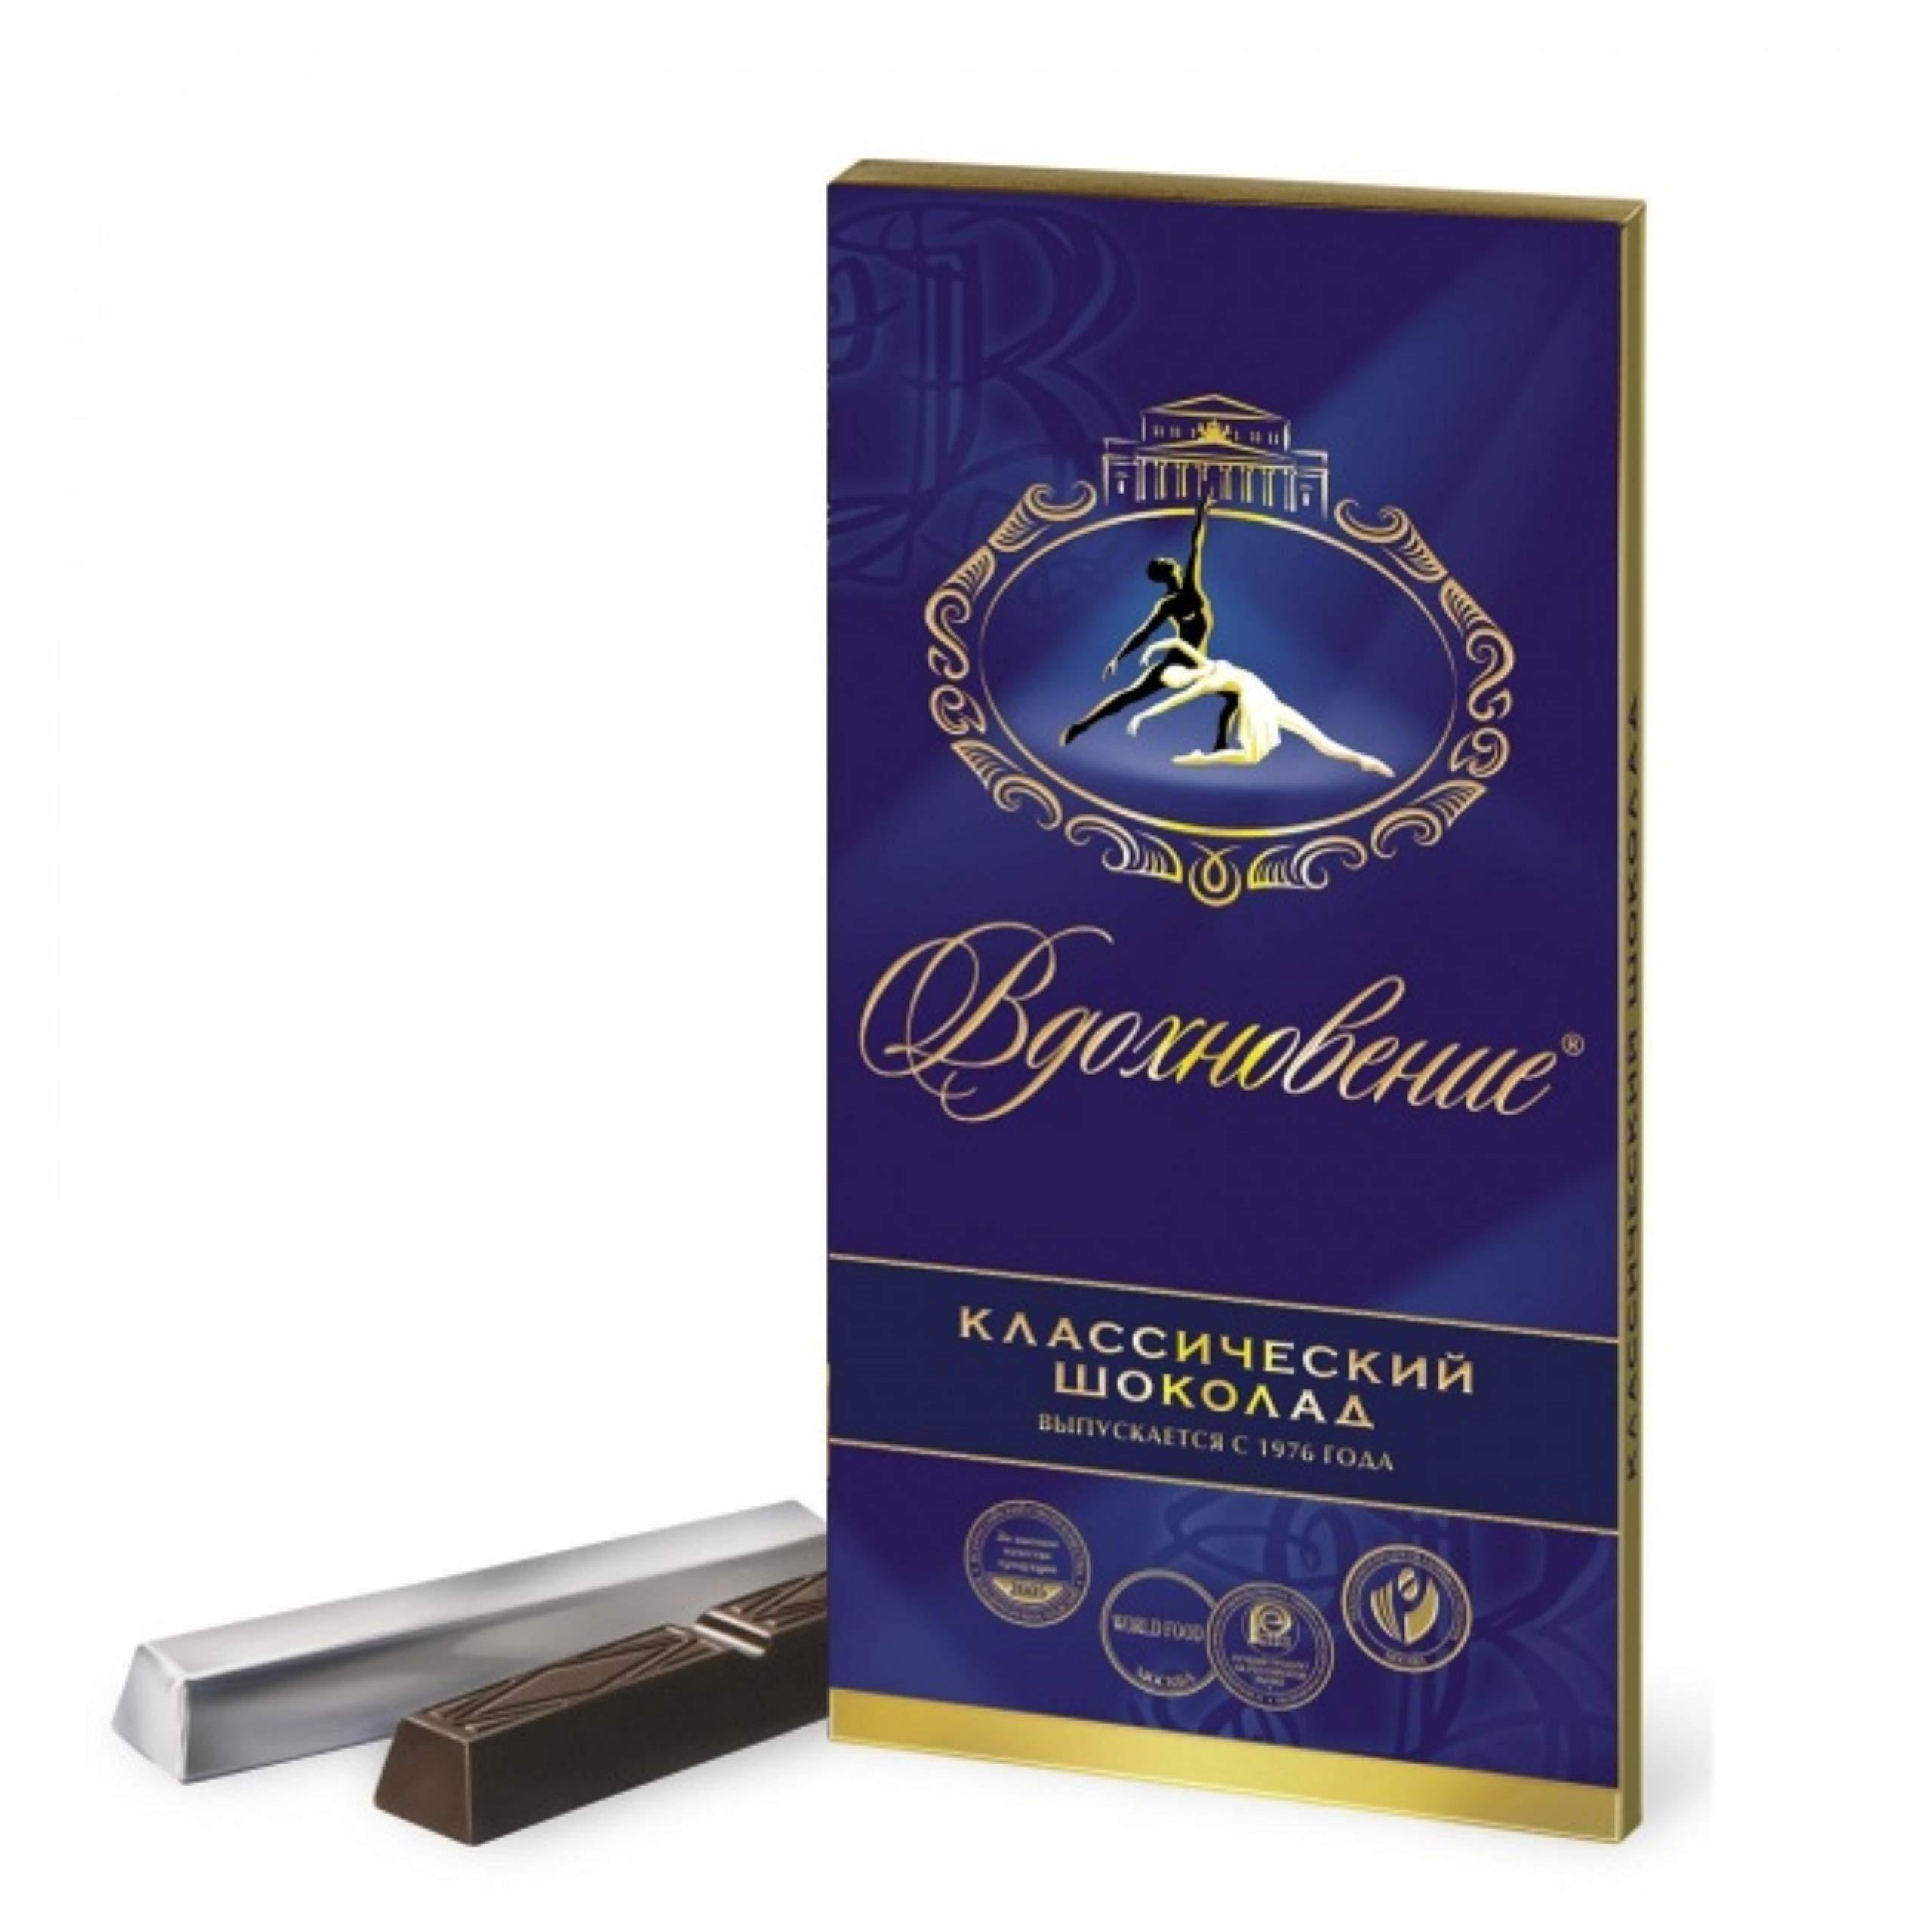 Russian Dark Chocolate «Vdohnovenie» Classic Krasnyi Oktyabr